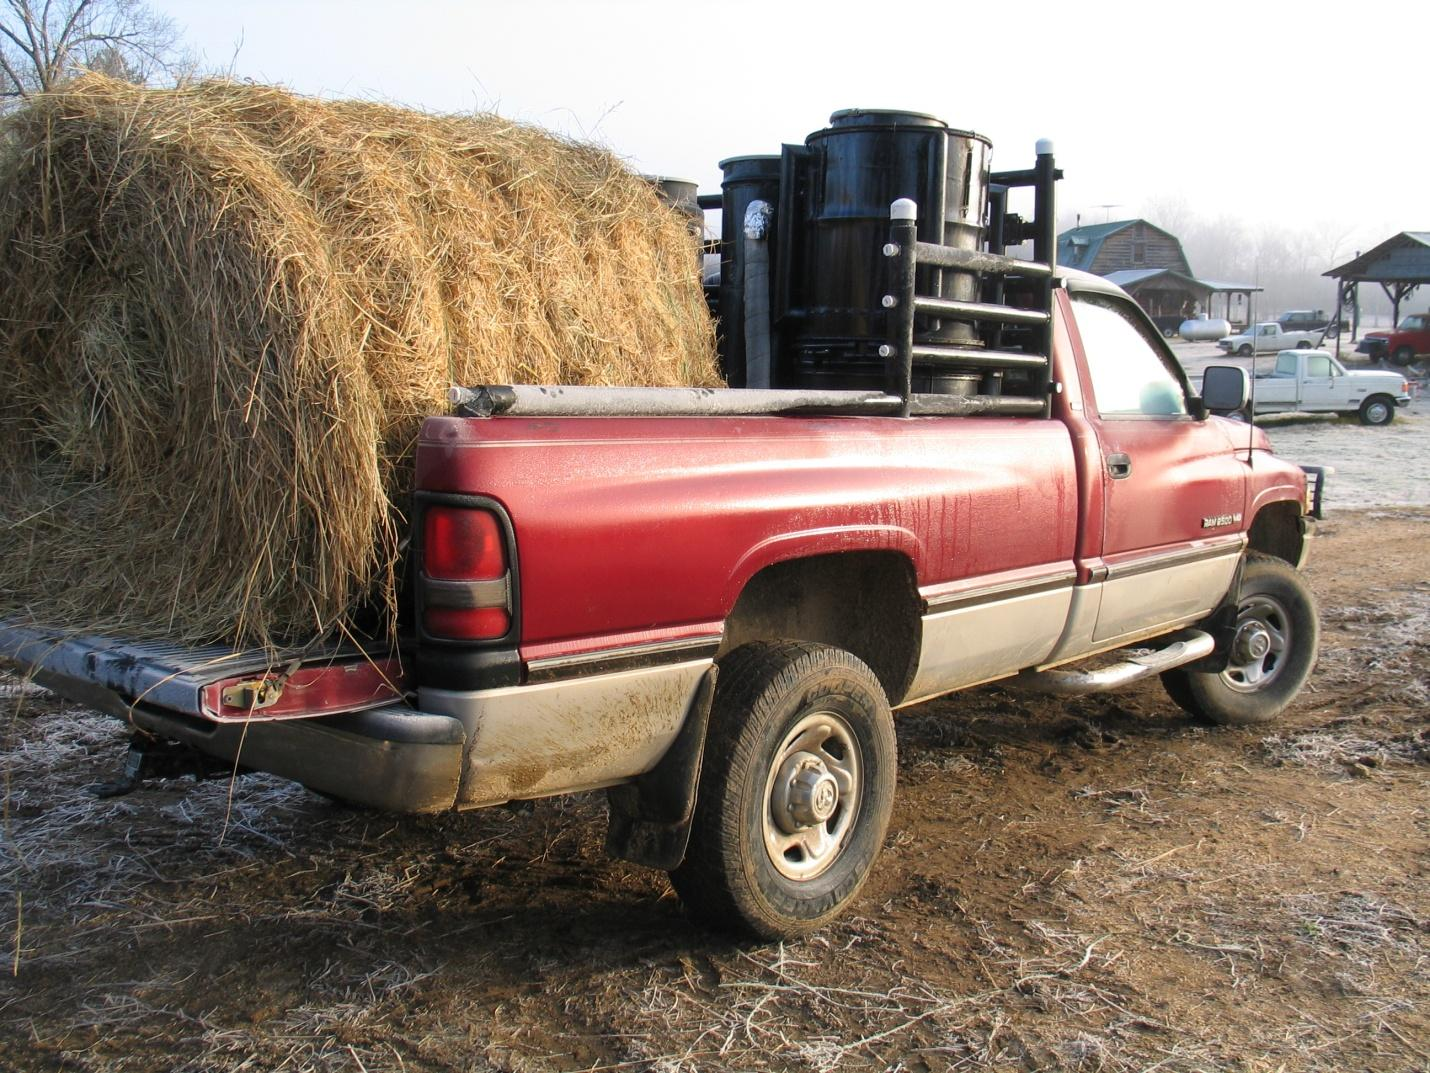 File:Woodgas farm truck.JPG - Wikimedia Commons